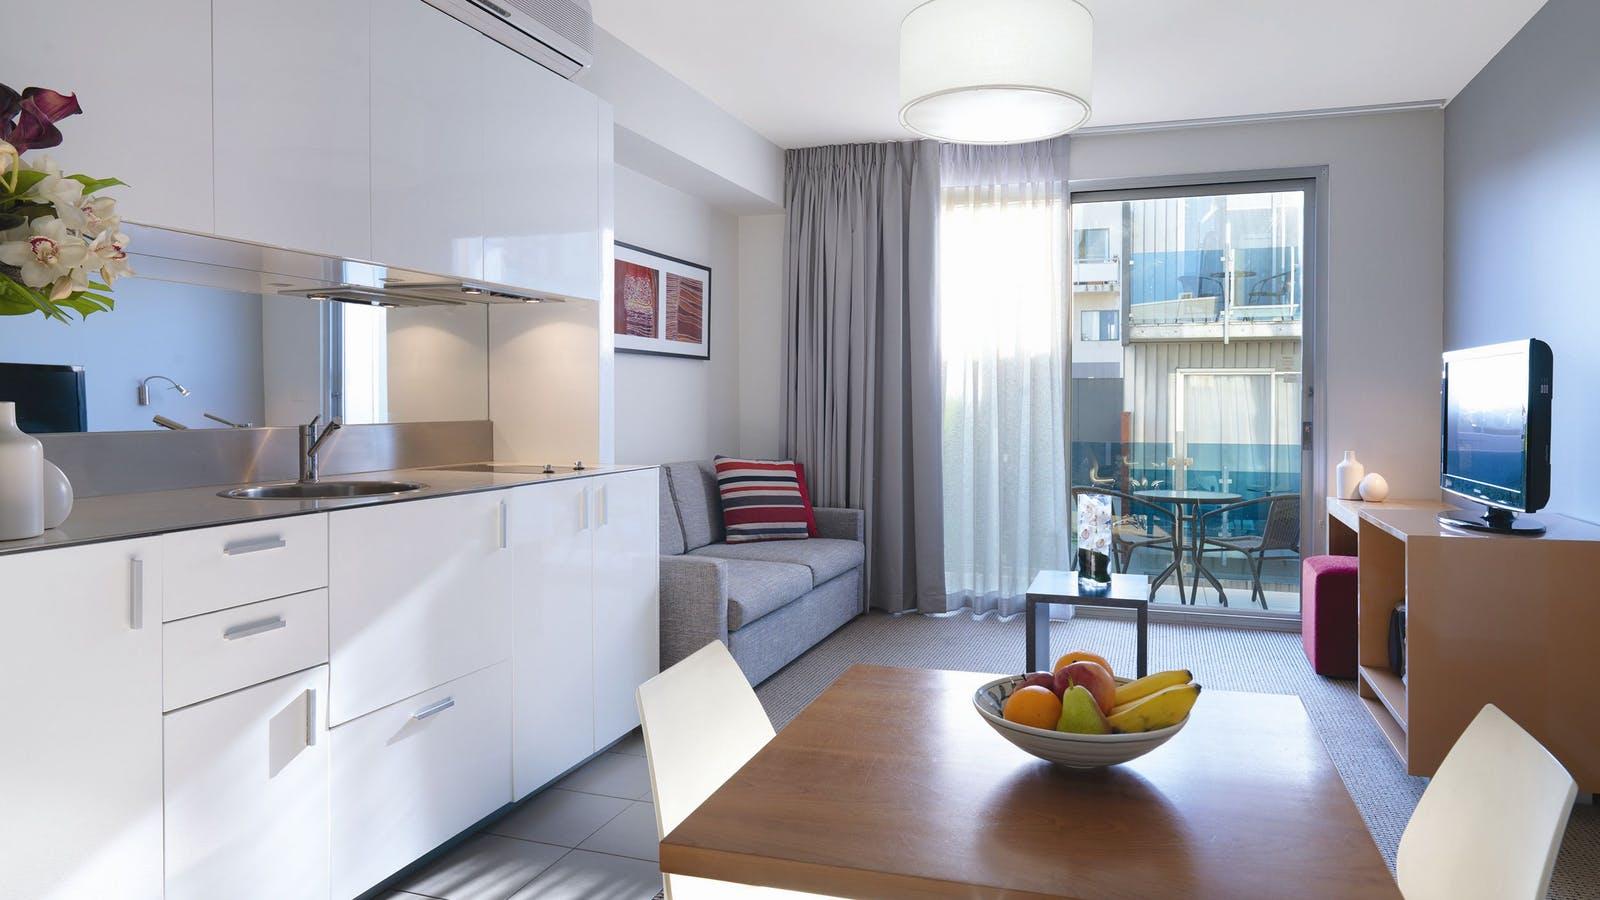 Adina Apartment Hotel St Kilda - Studio Lounge